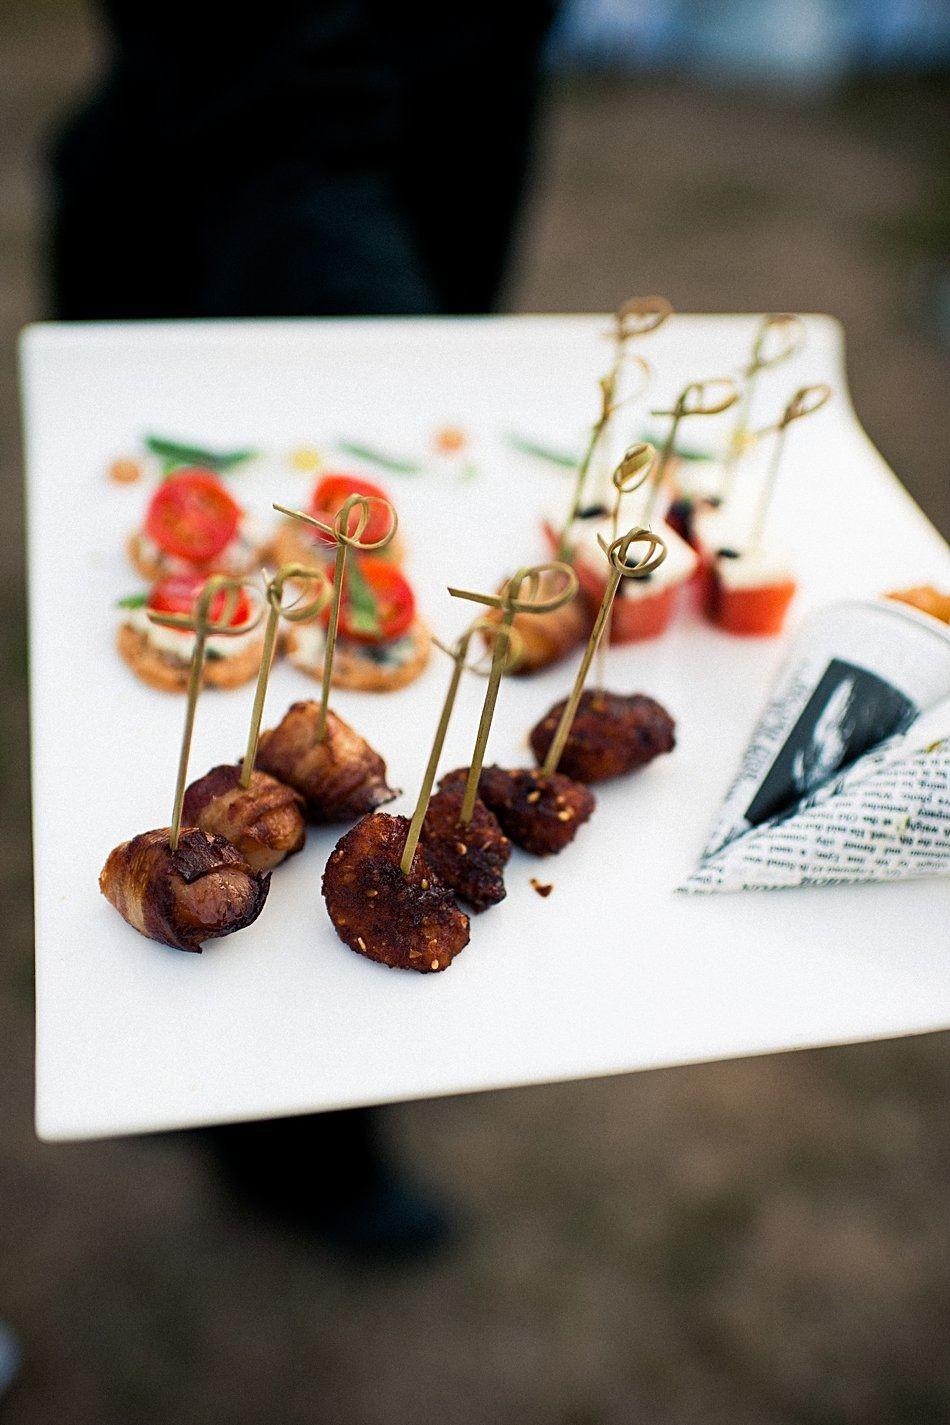 Coastal rhode island wedding menu inspiration bacon